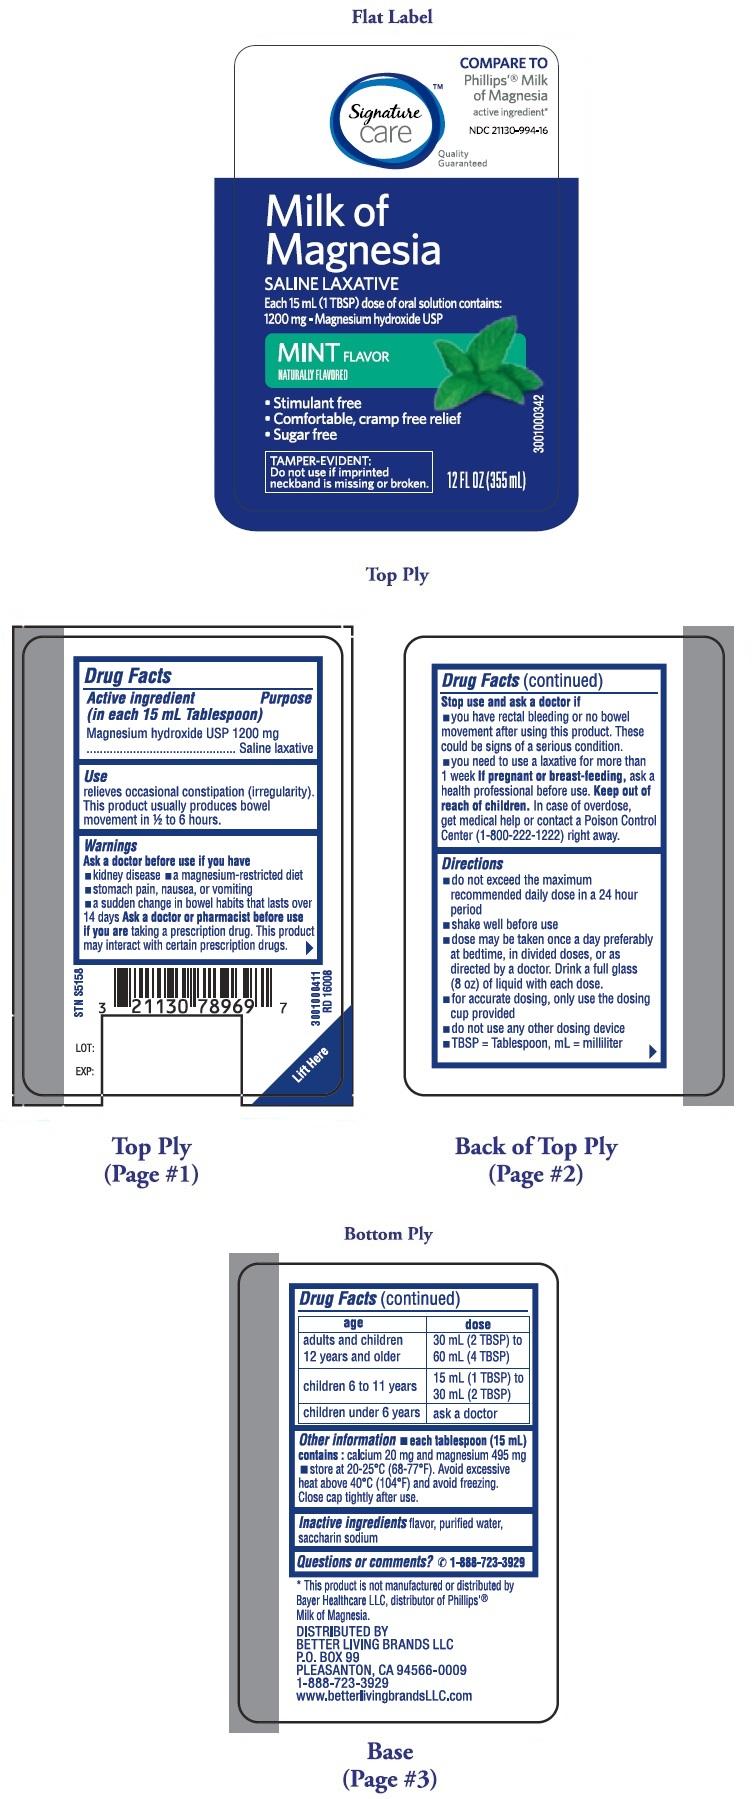 PACKAGE LABEL-PRINCIPAL DISPLAY PANEL - 12 FL OZ (355 mL) Bottle